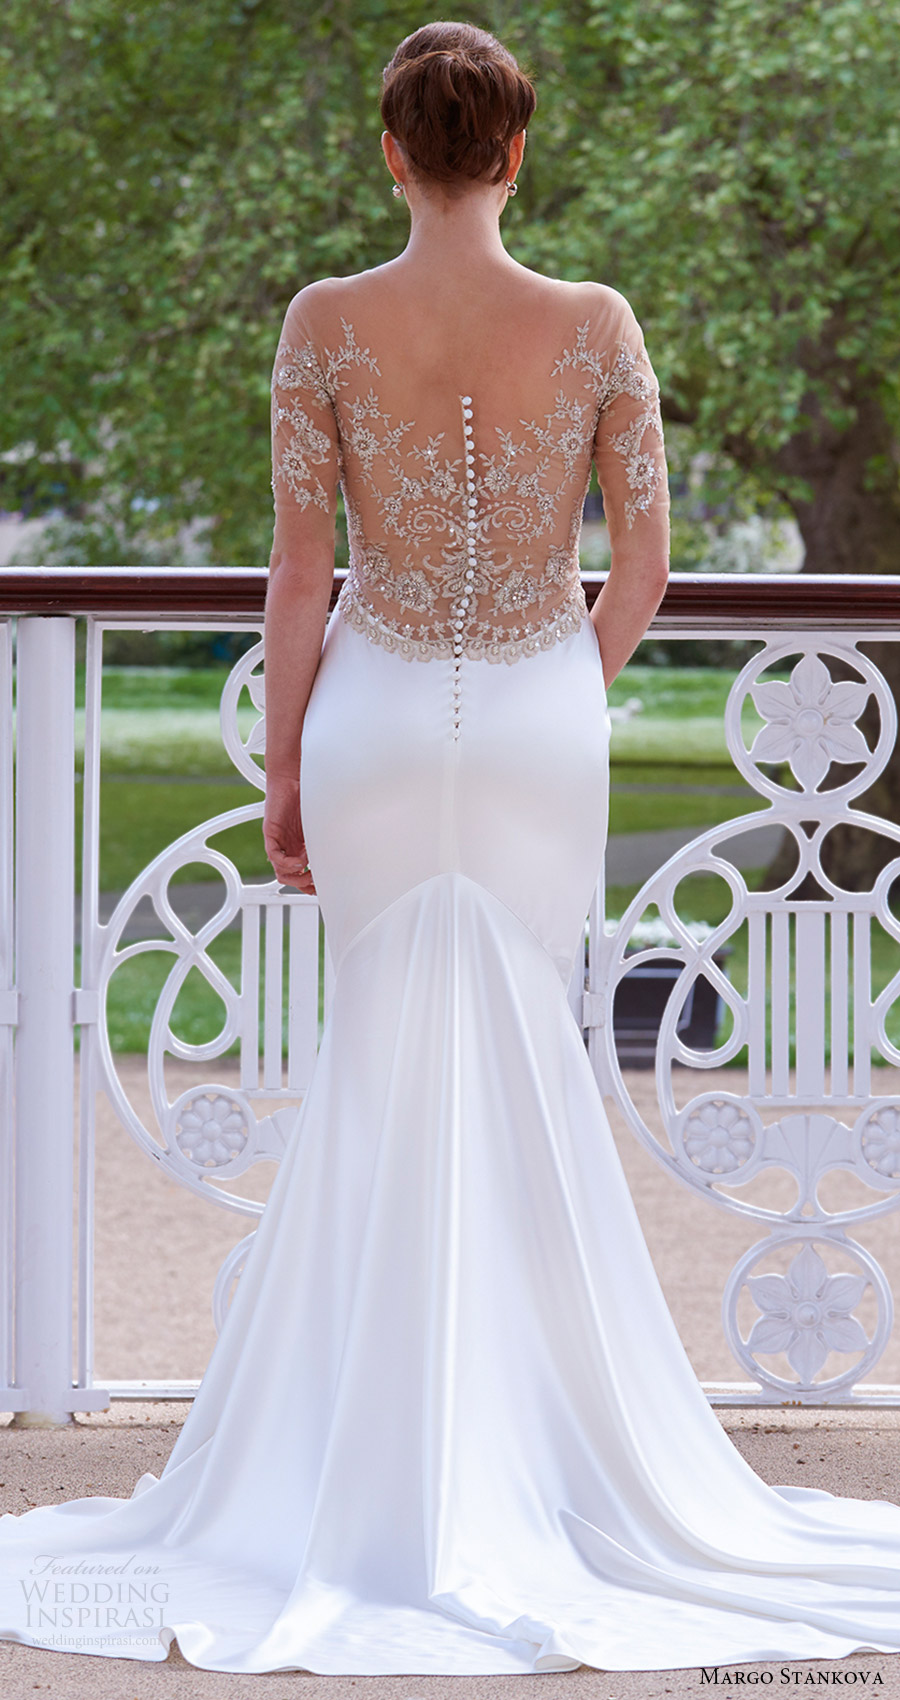 margo stankova bridal 2017 illusion long sleeves vneck beaded bodice sheath wedding dress (03) bv illusion back train